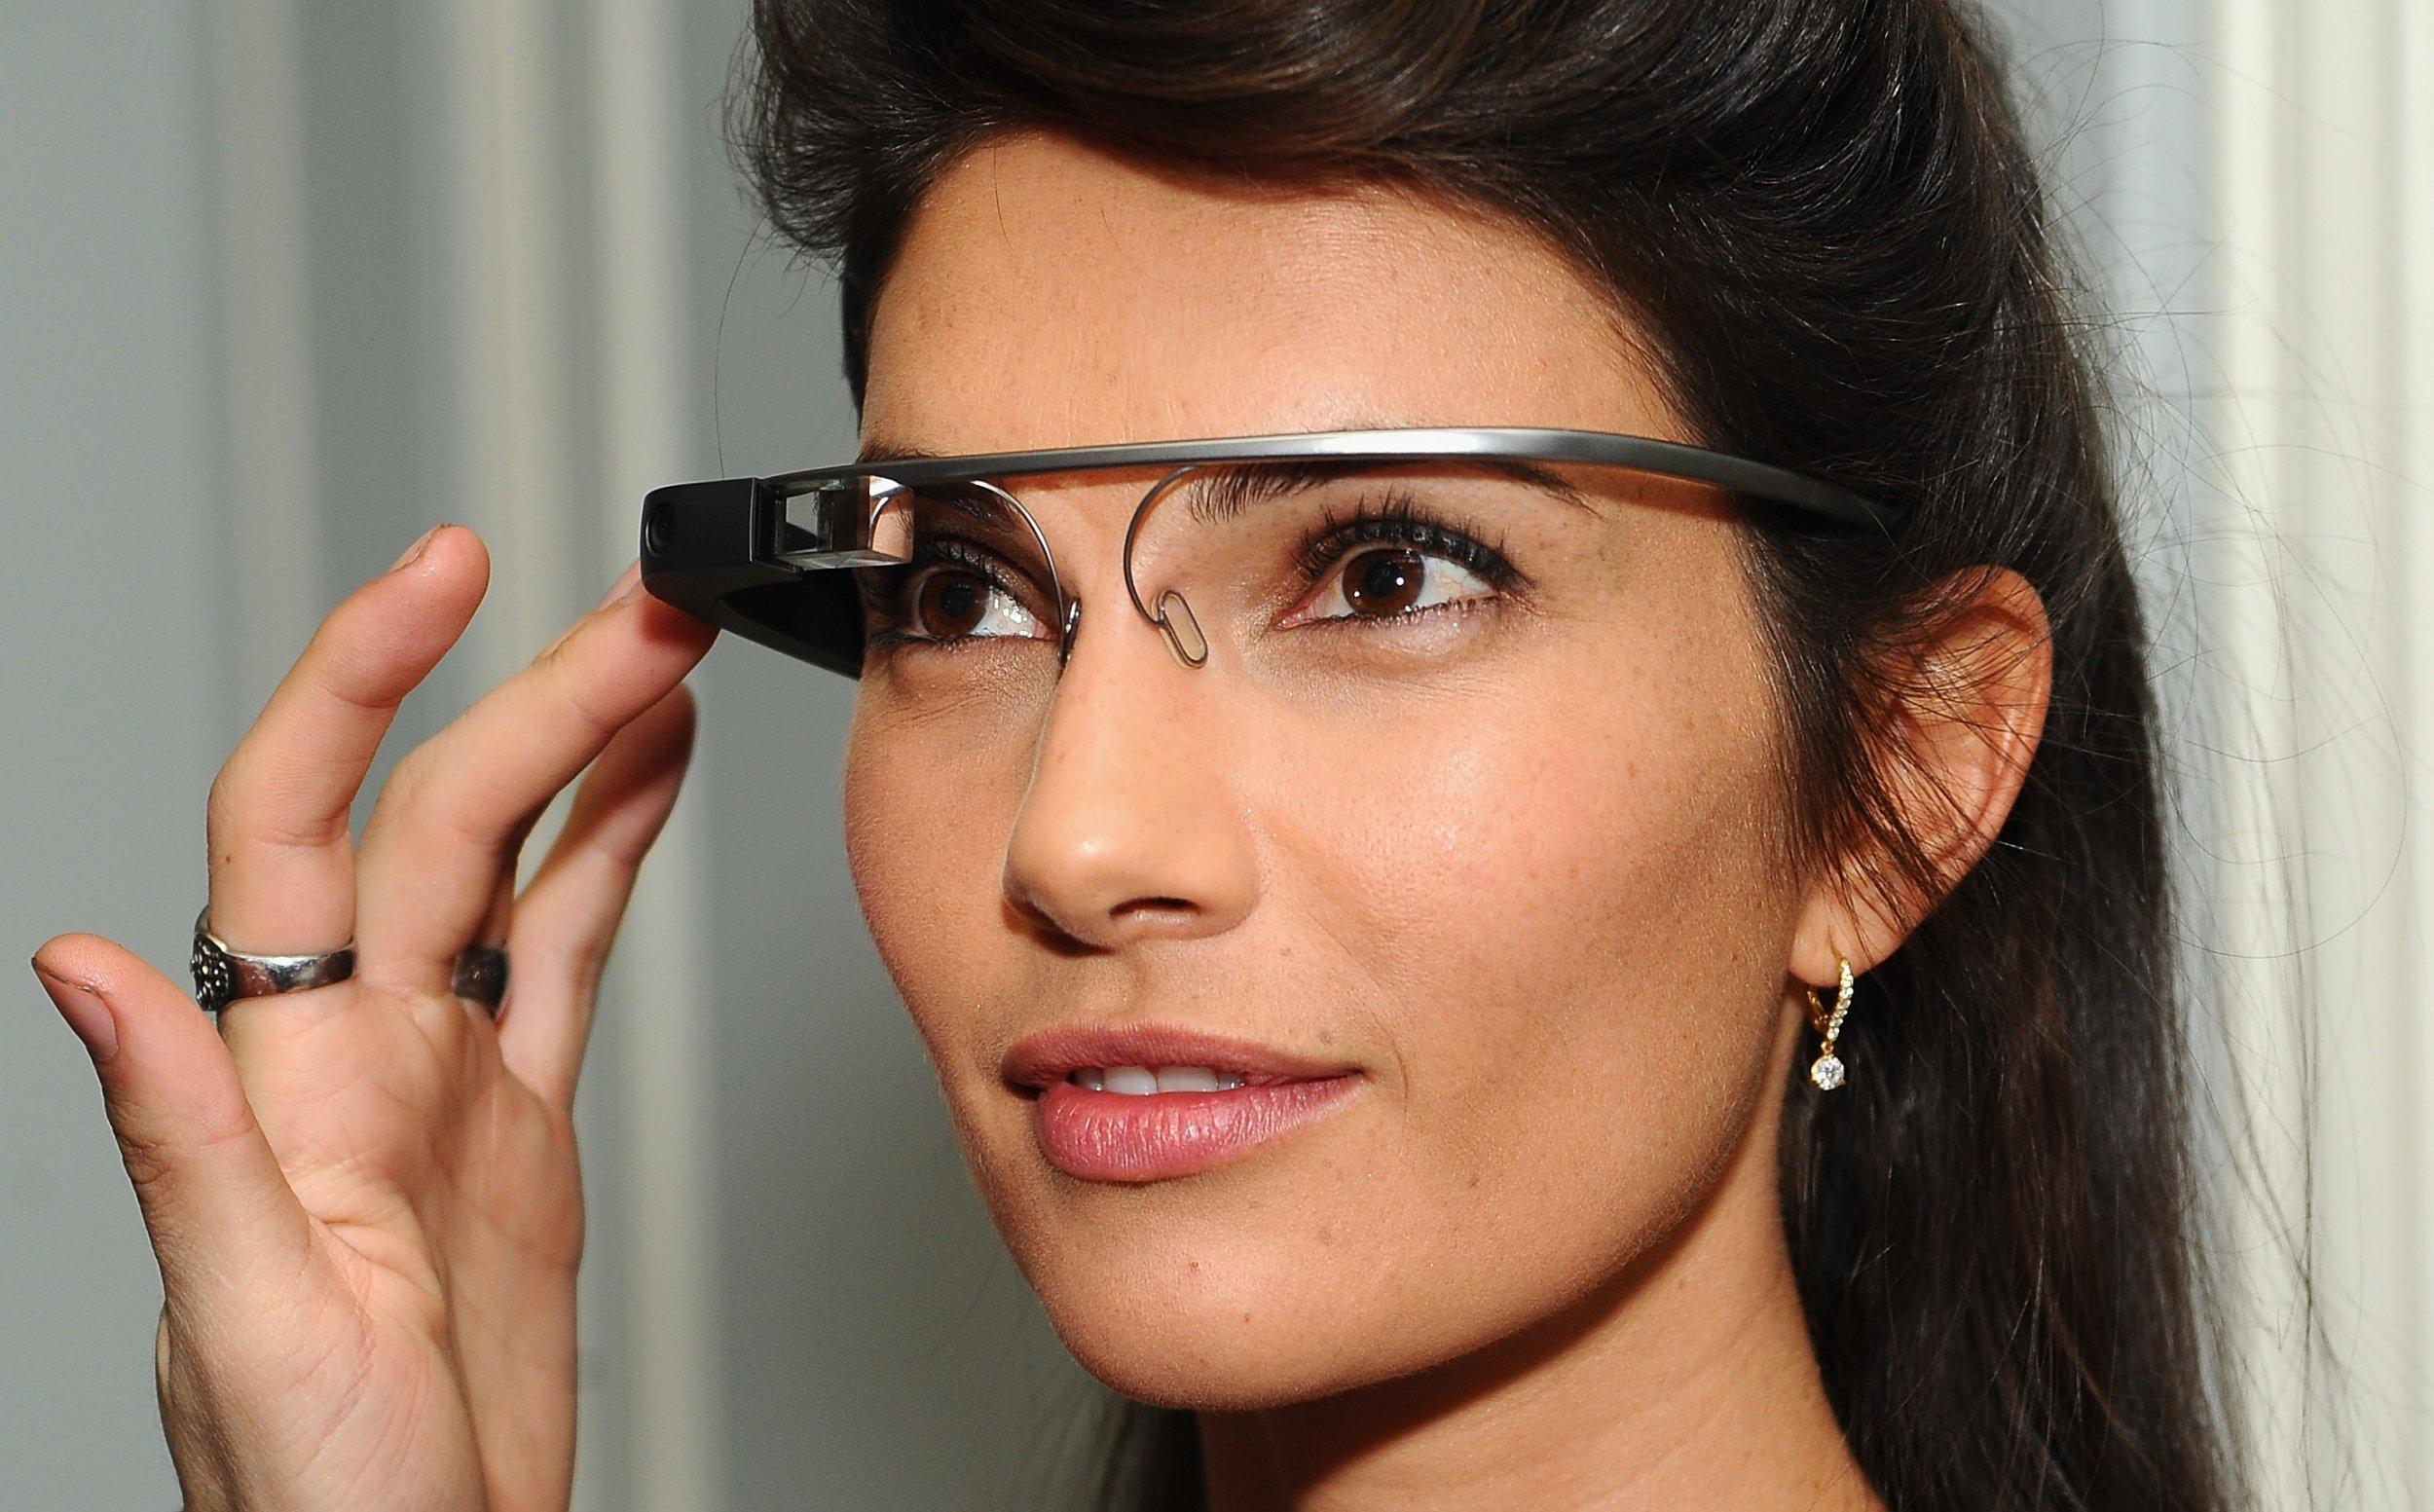 biometrics skullconduct skull google glass